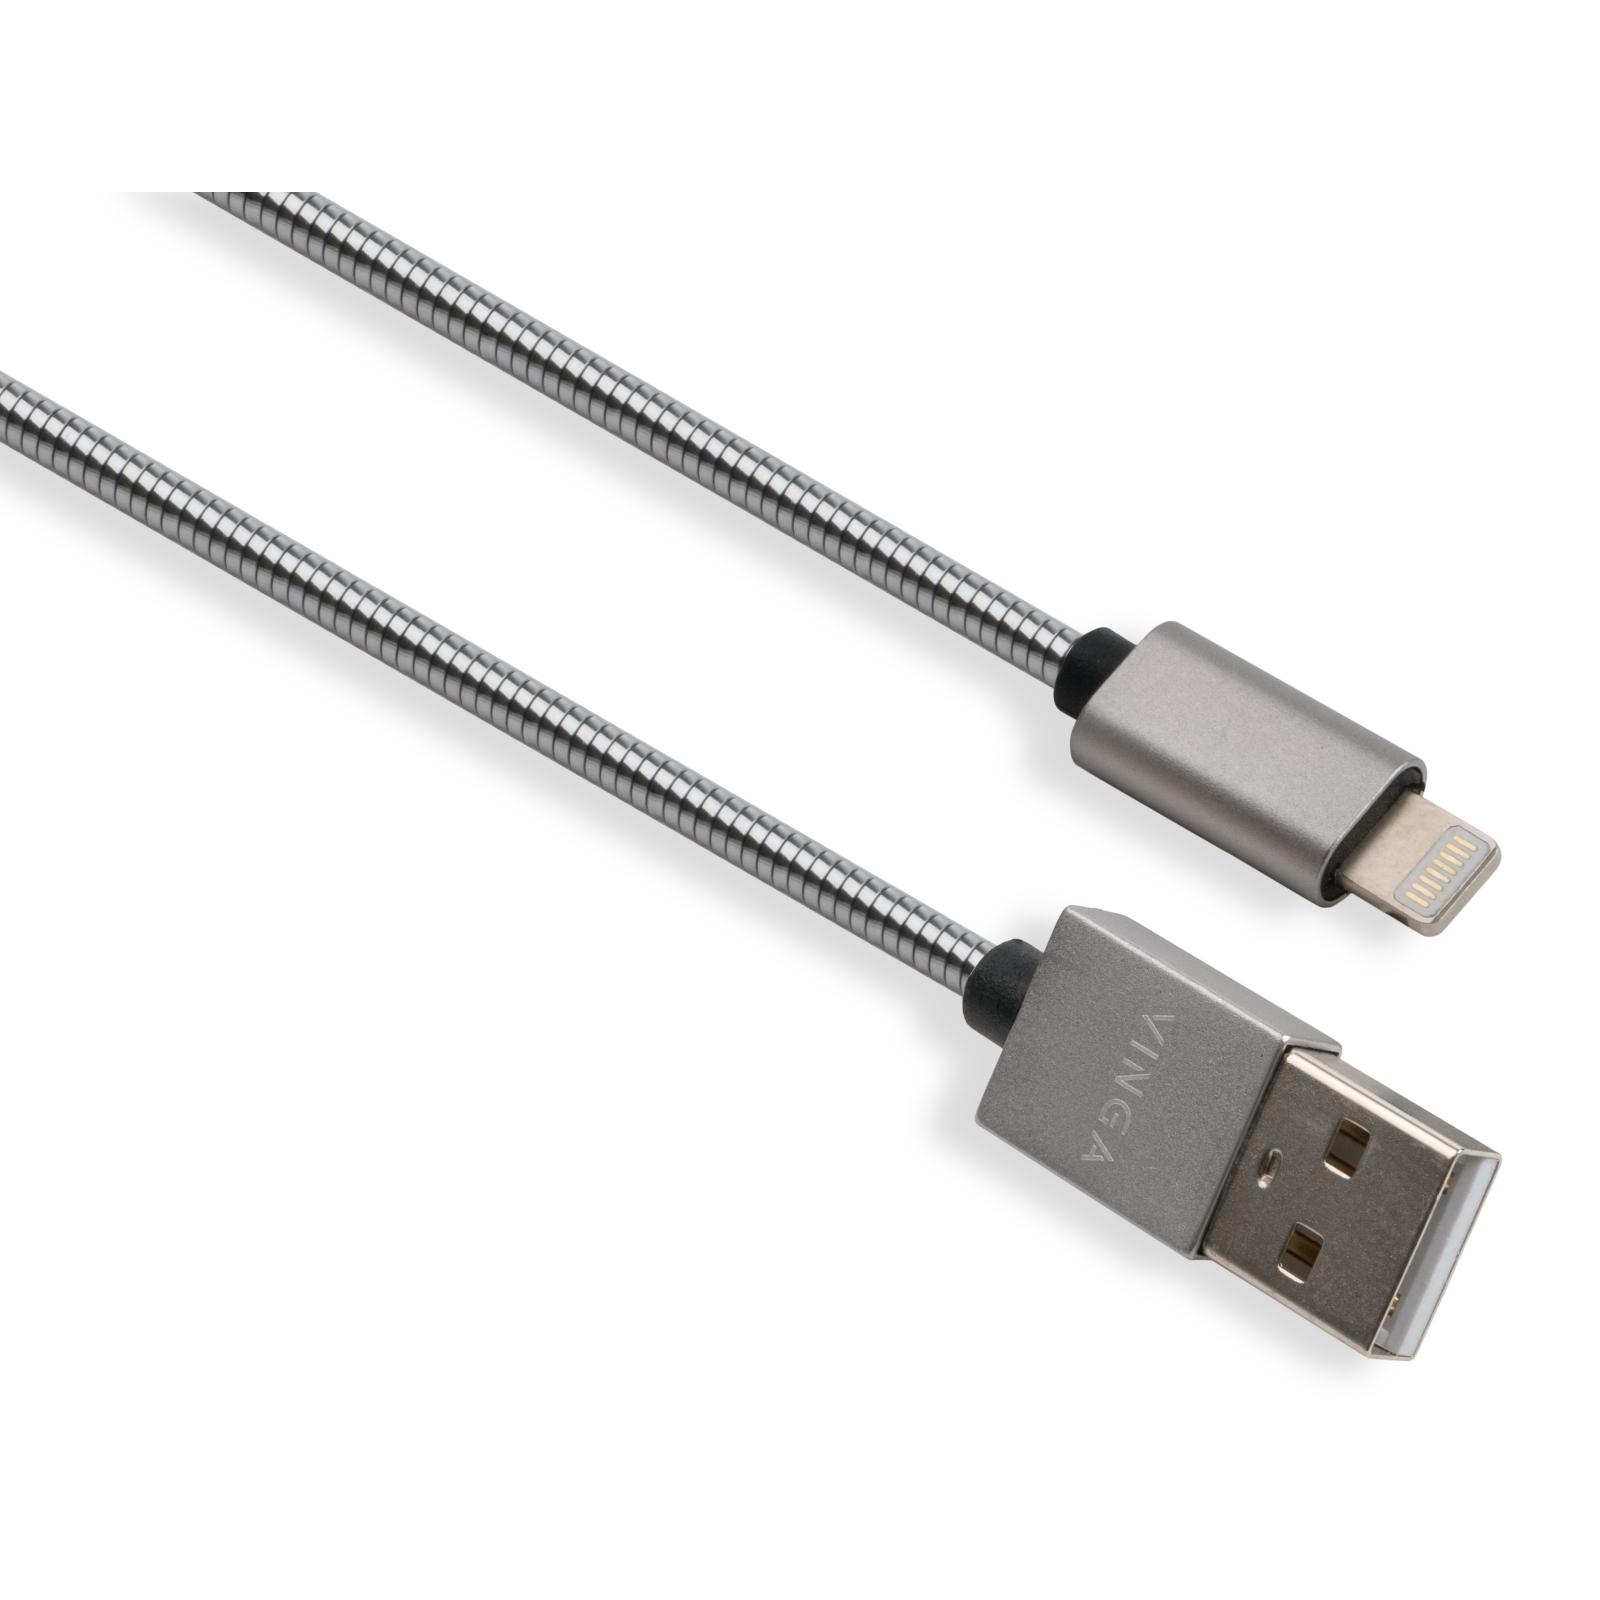 Дата кабель USB 2.0 AM to Lightning 1m stainless steel silver Vinga (VCPDCLSSJ1S)